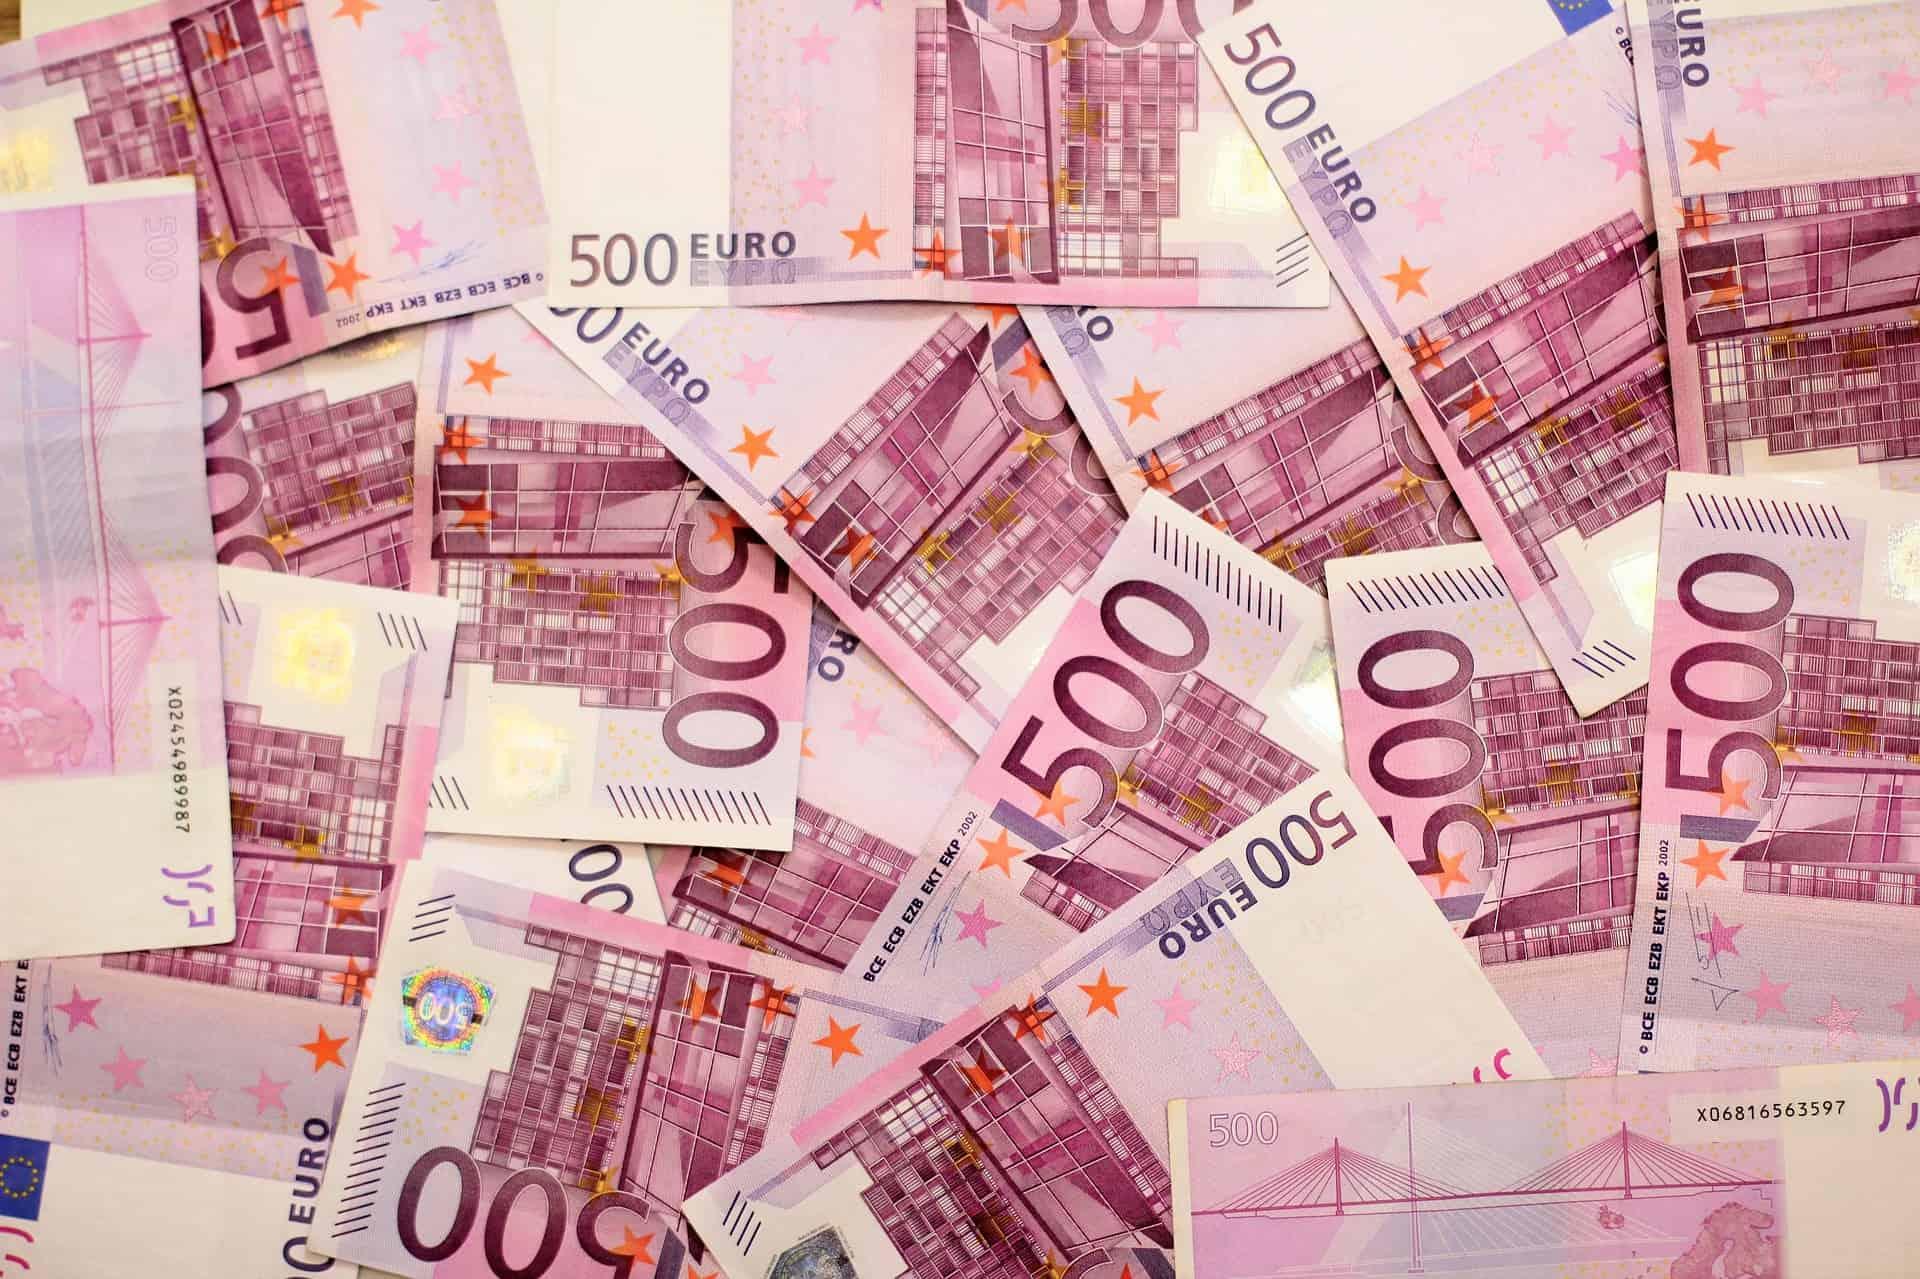 Dauer Urlaub - Gewinn den Eurojackpot 84 Millionen 1